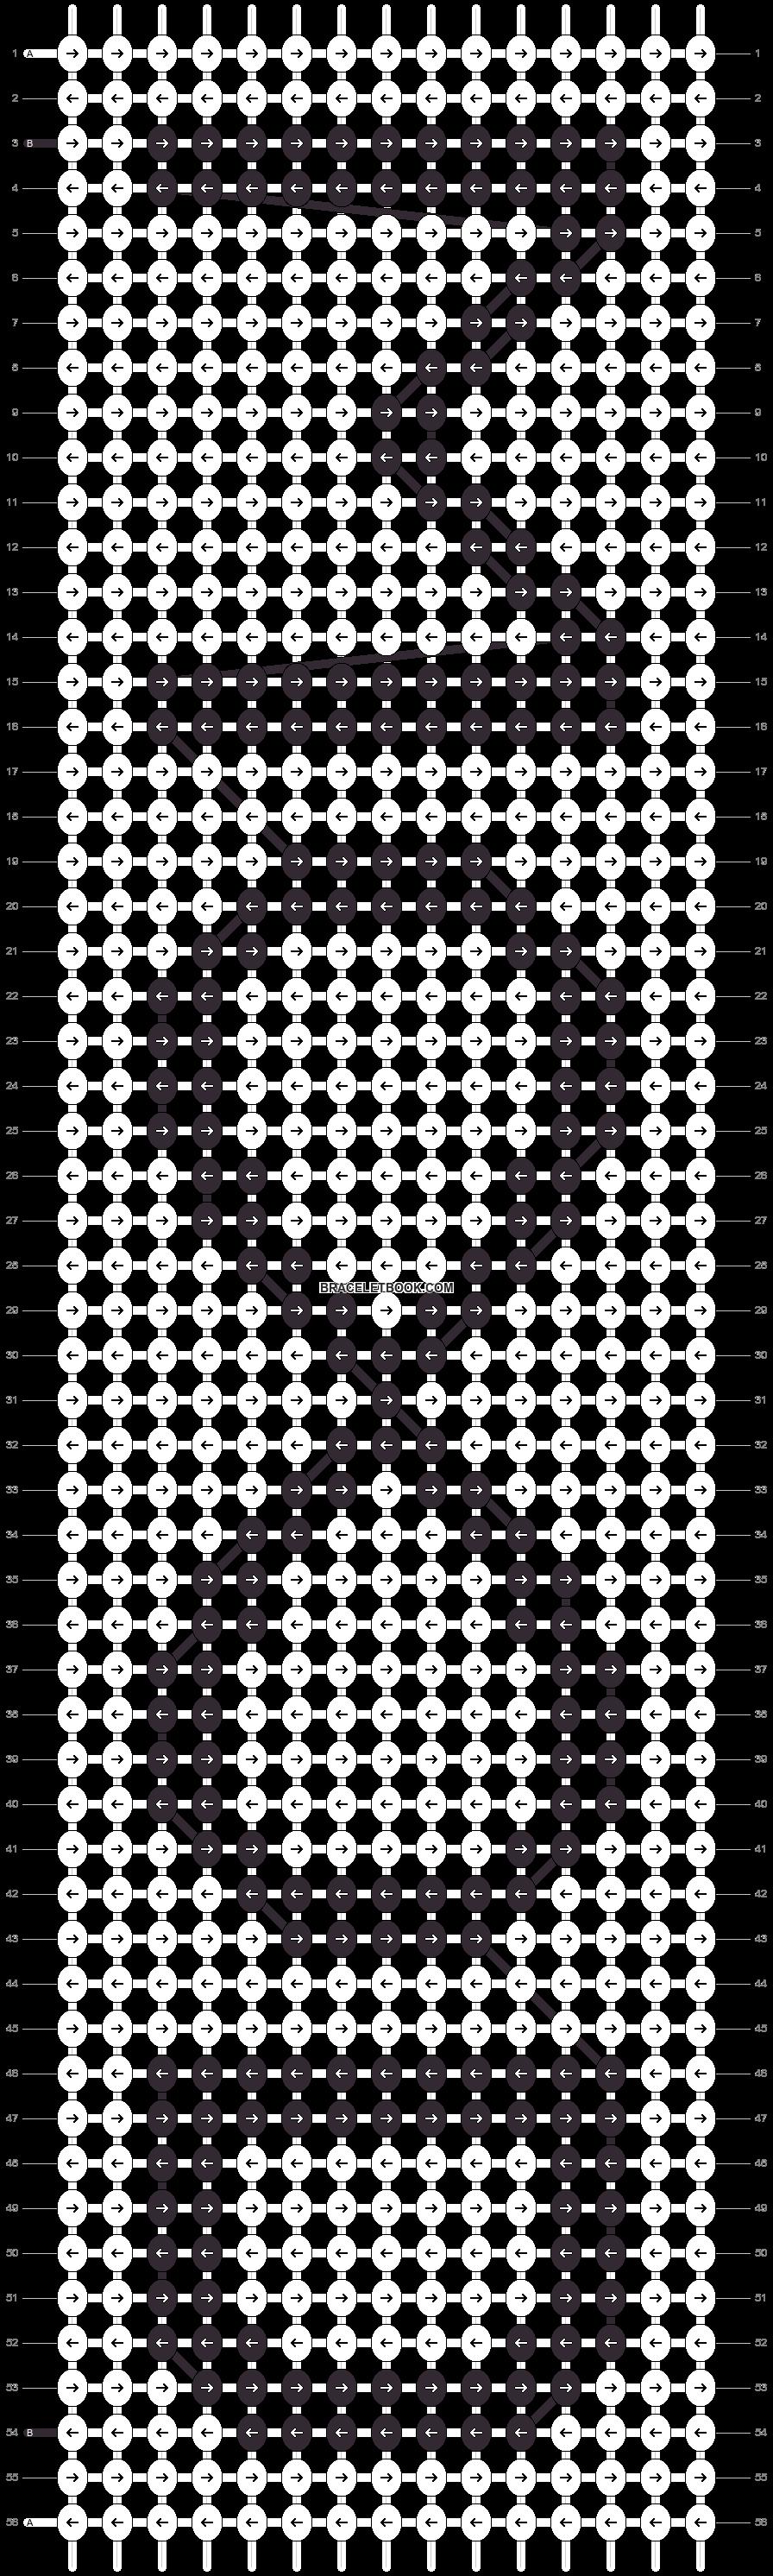 Alpha pattern #14338 pattern